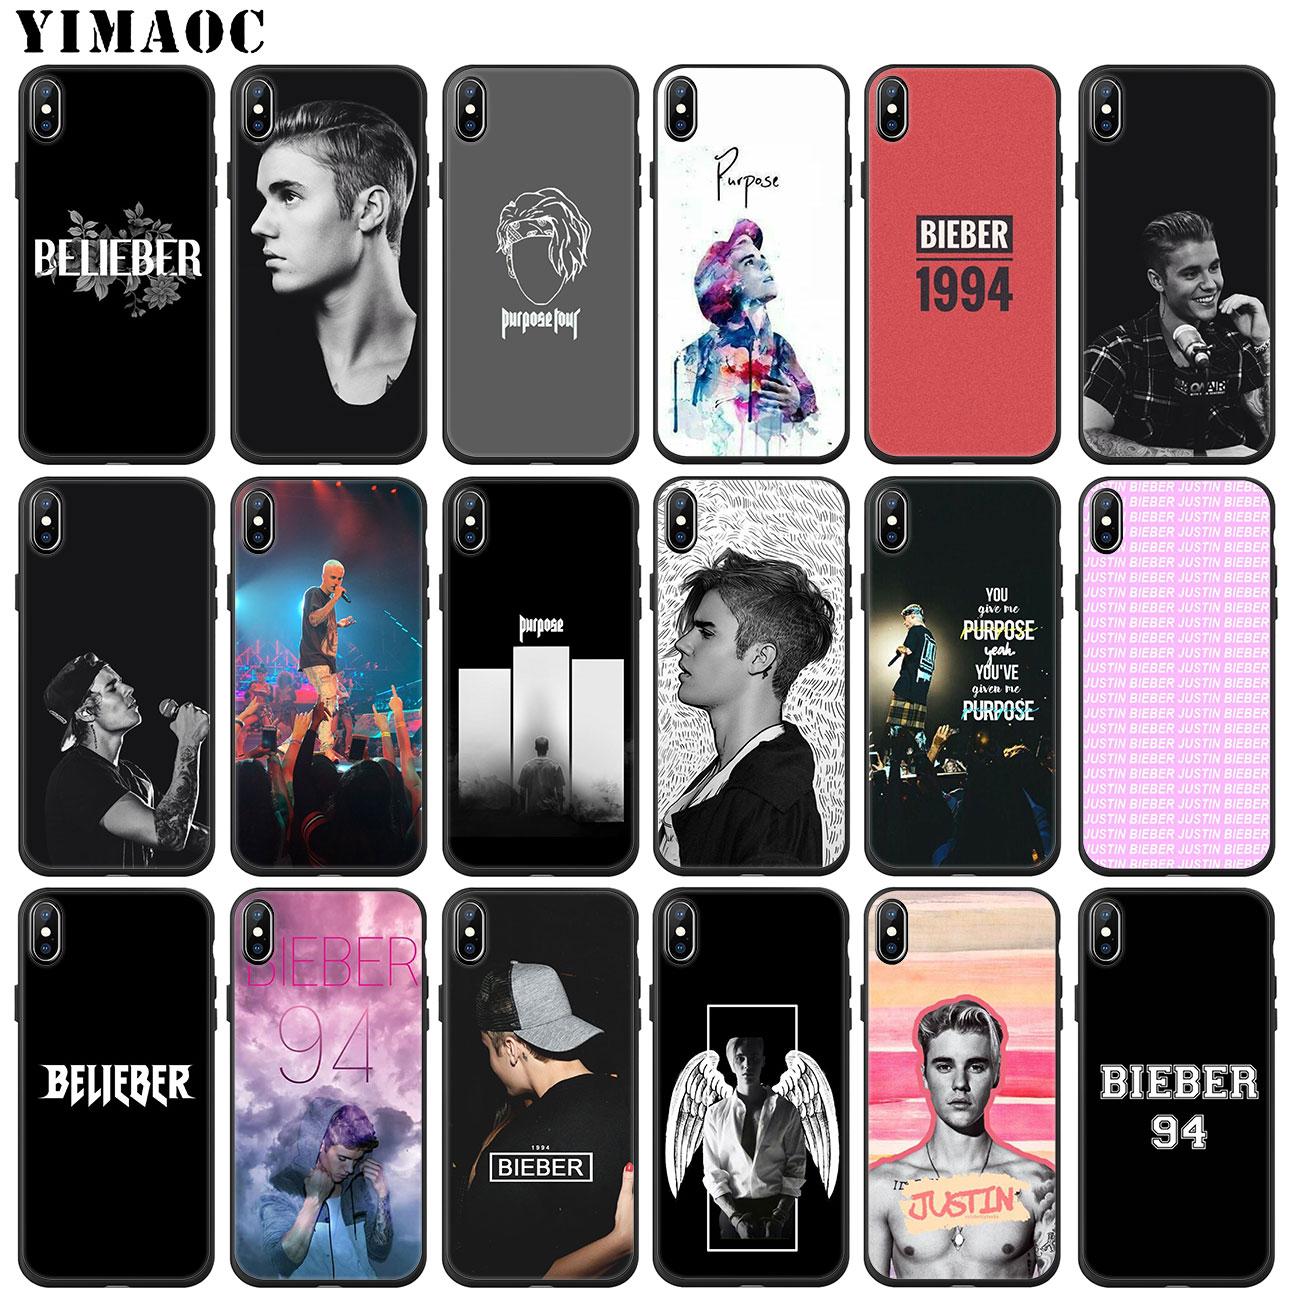 YIMAOC Justin Bieber Caso de Telefone Silicone Macio para o iphone 11 XS Pro Max XR X 6 6S 7 8 além de 5 5S SE 10 TPU Capa Preta